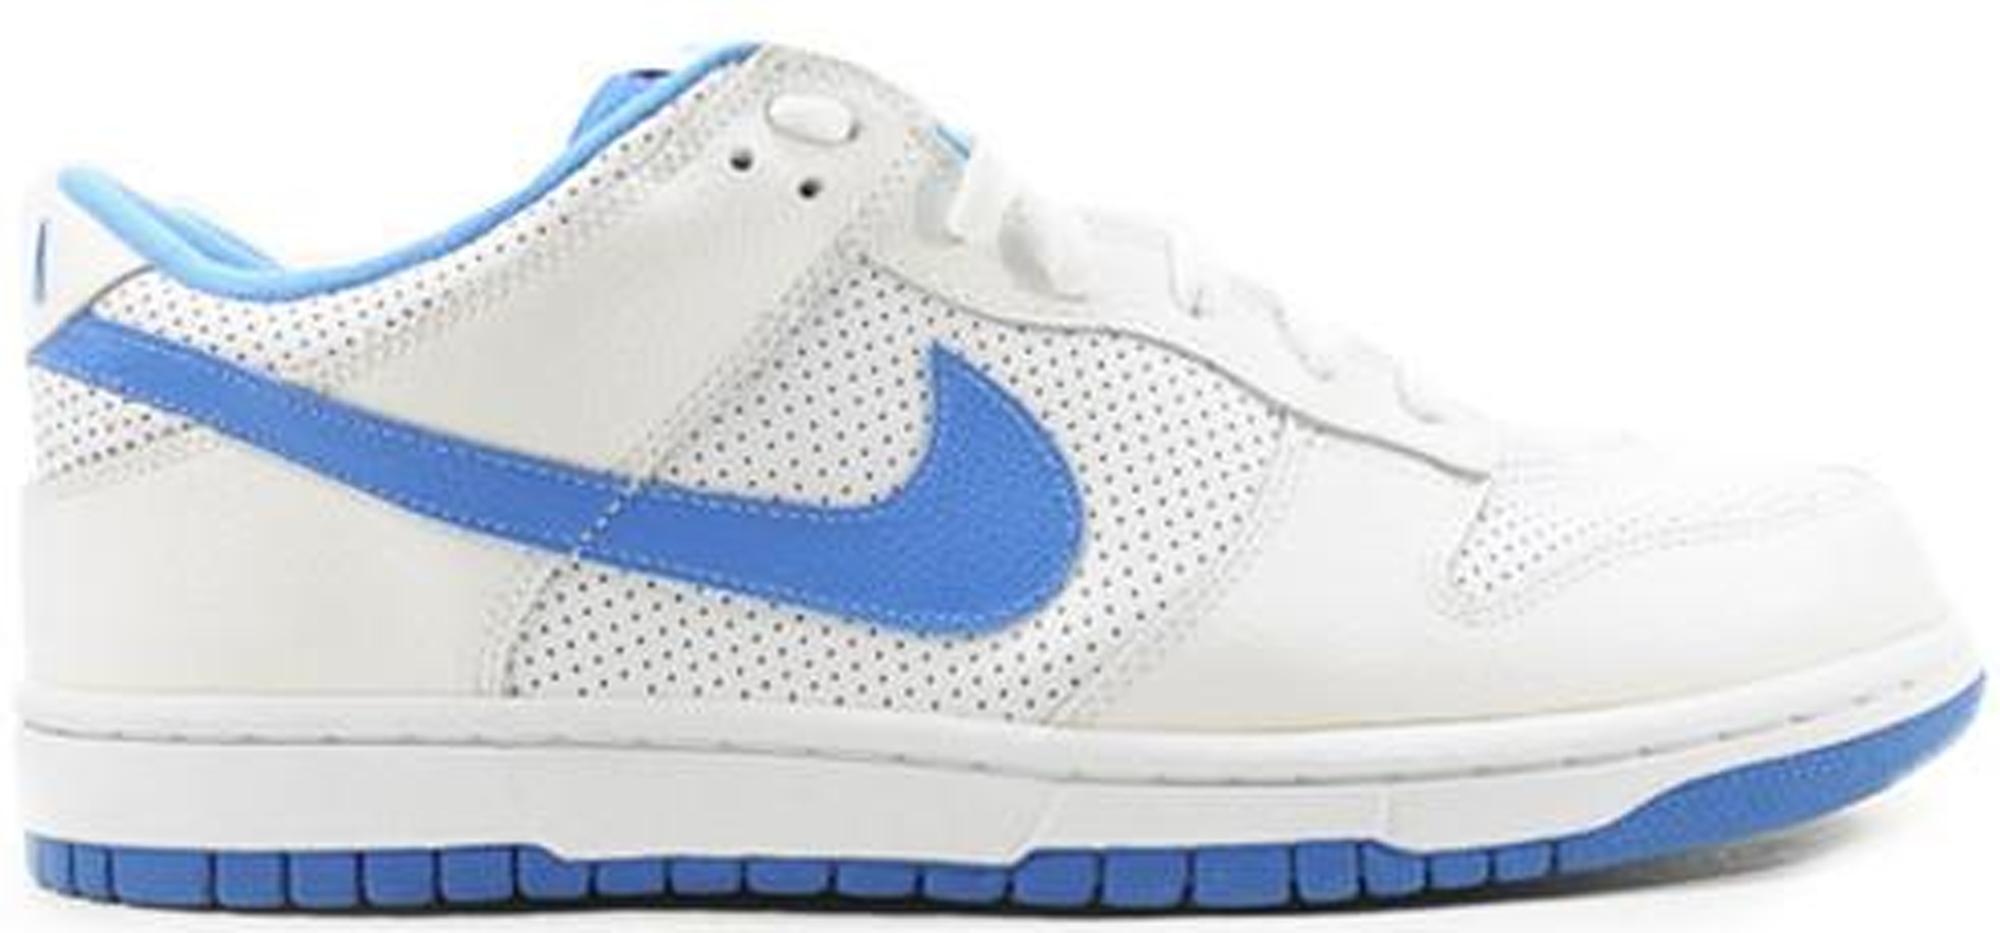 Nike Dunk Low Varsity Blue Perf